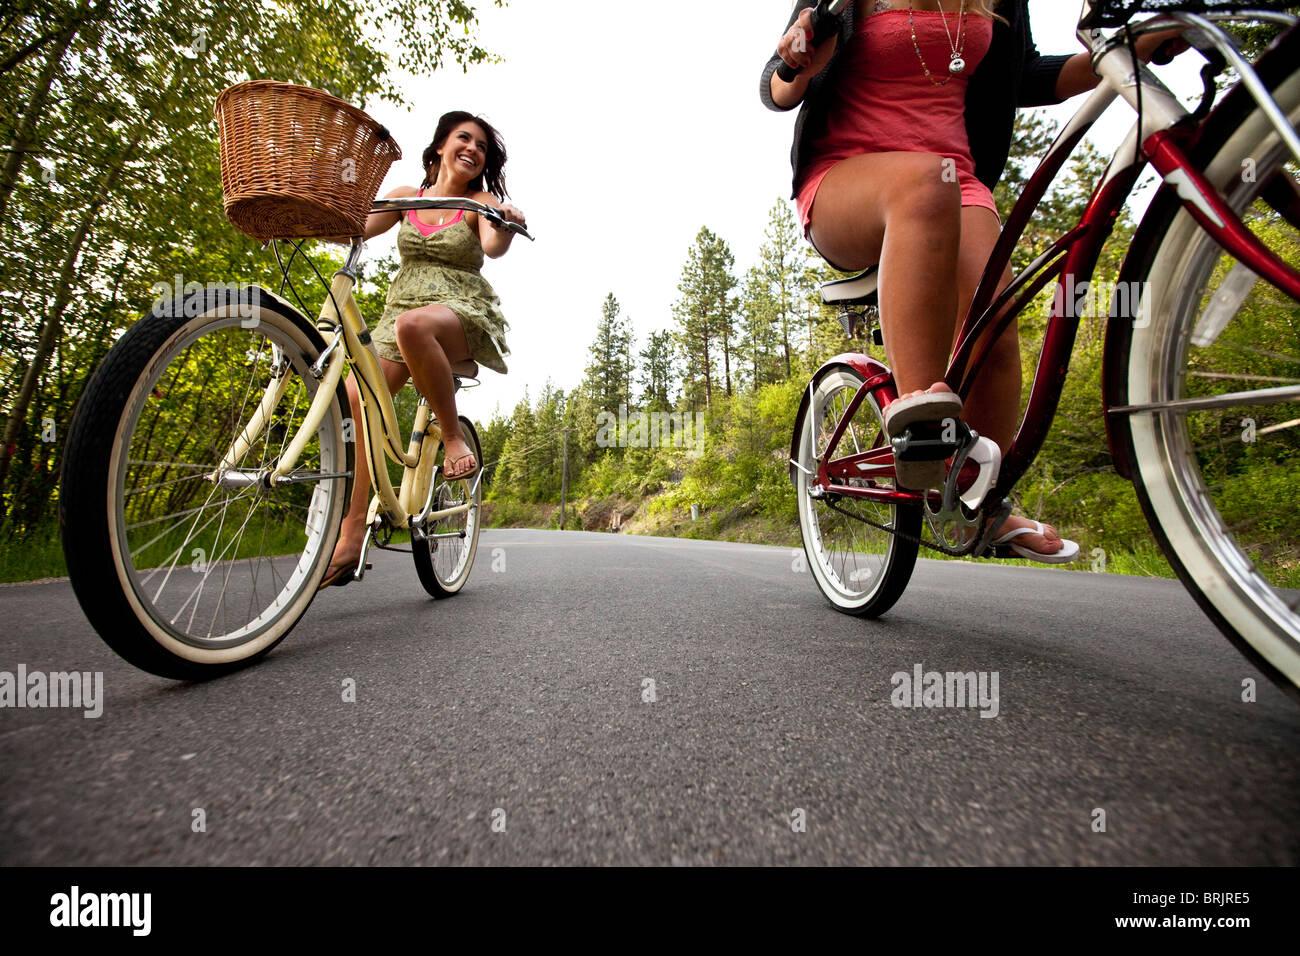 Les femmes ride beach cruisers près du lac dans l'Idaho. Photo Stock